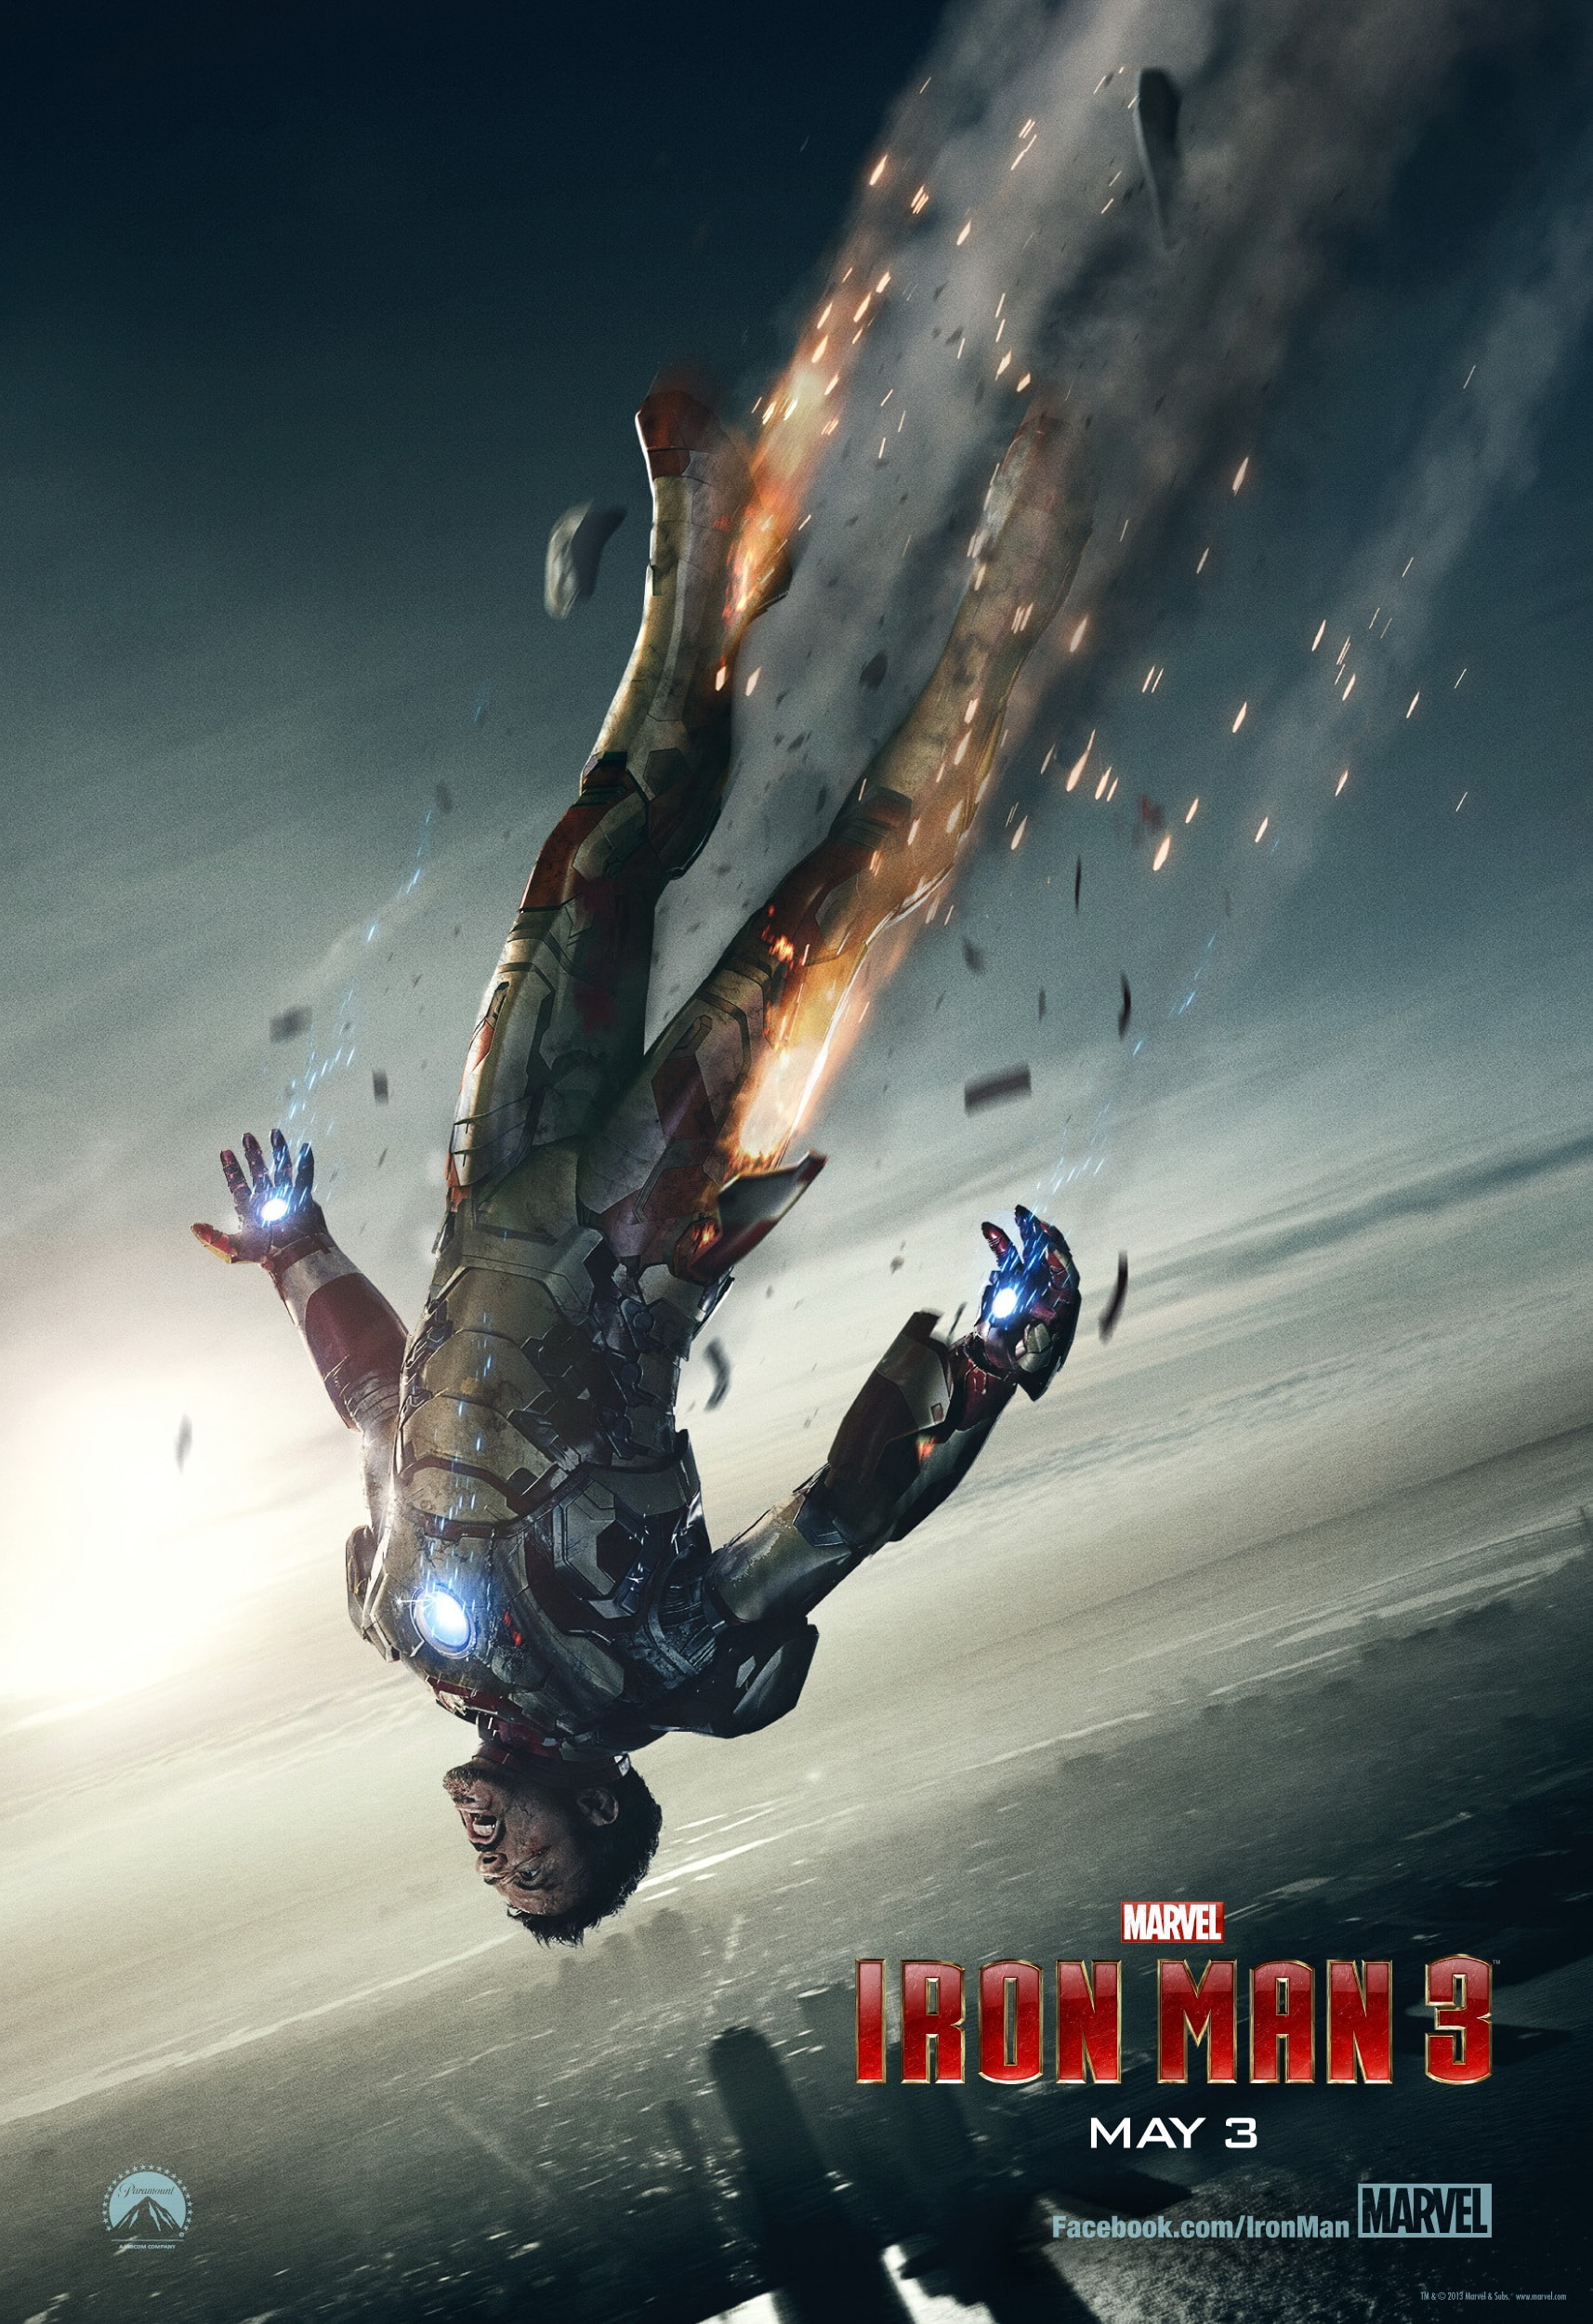 Iron man 3 Marvel Studios